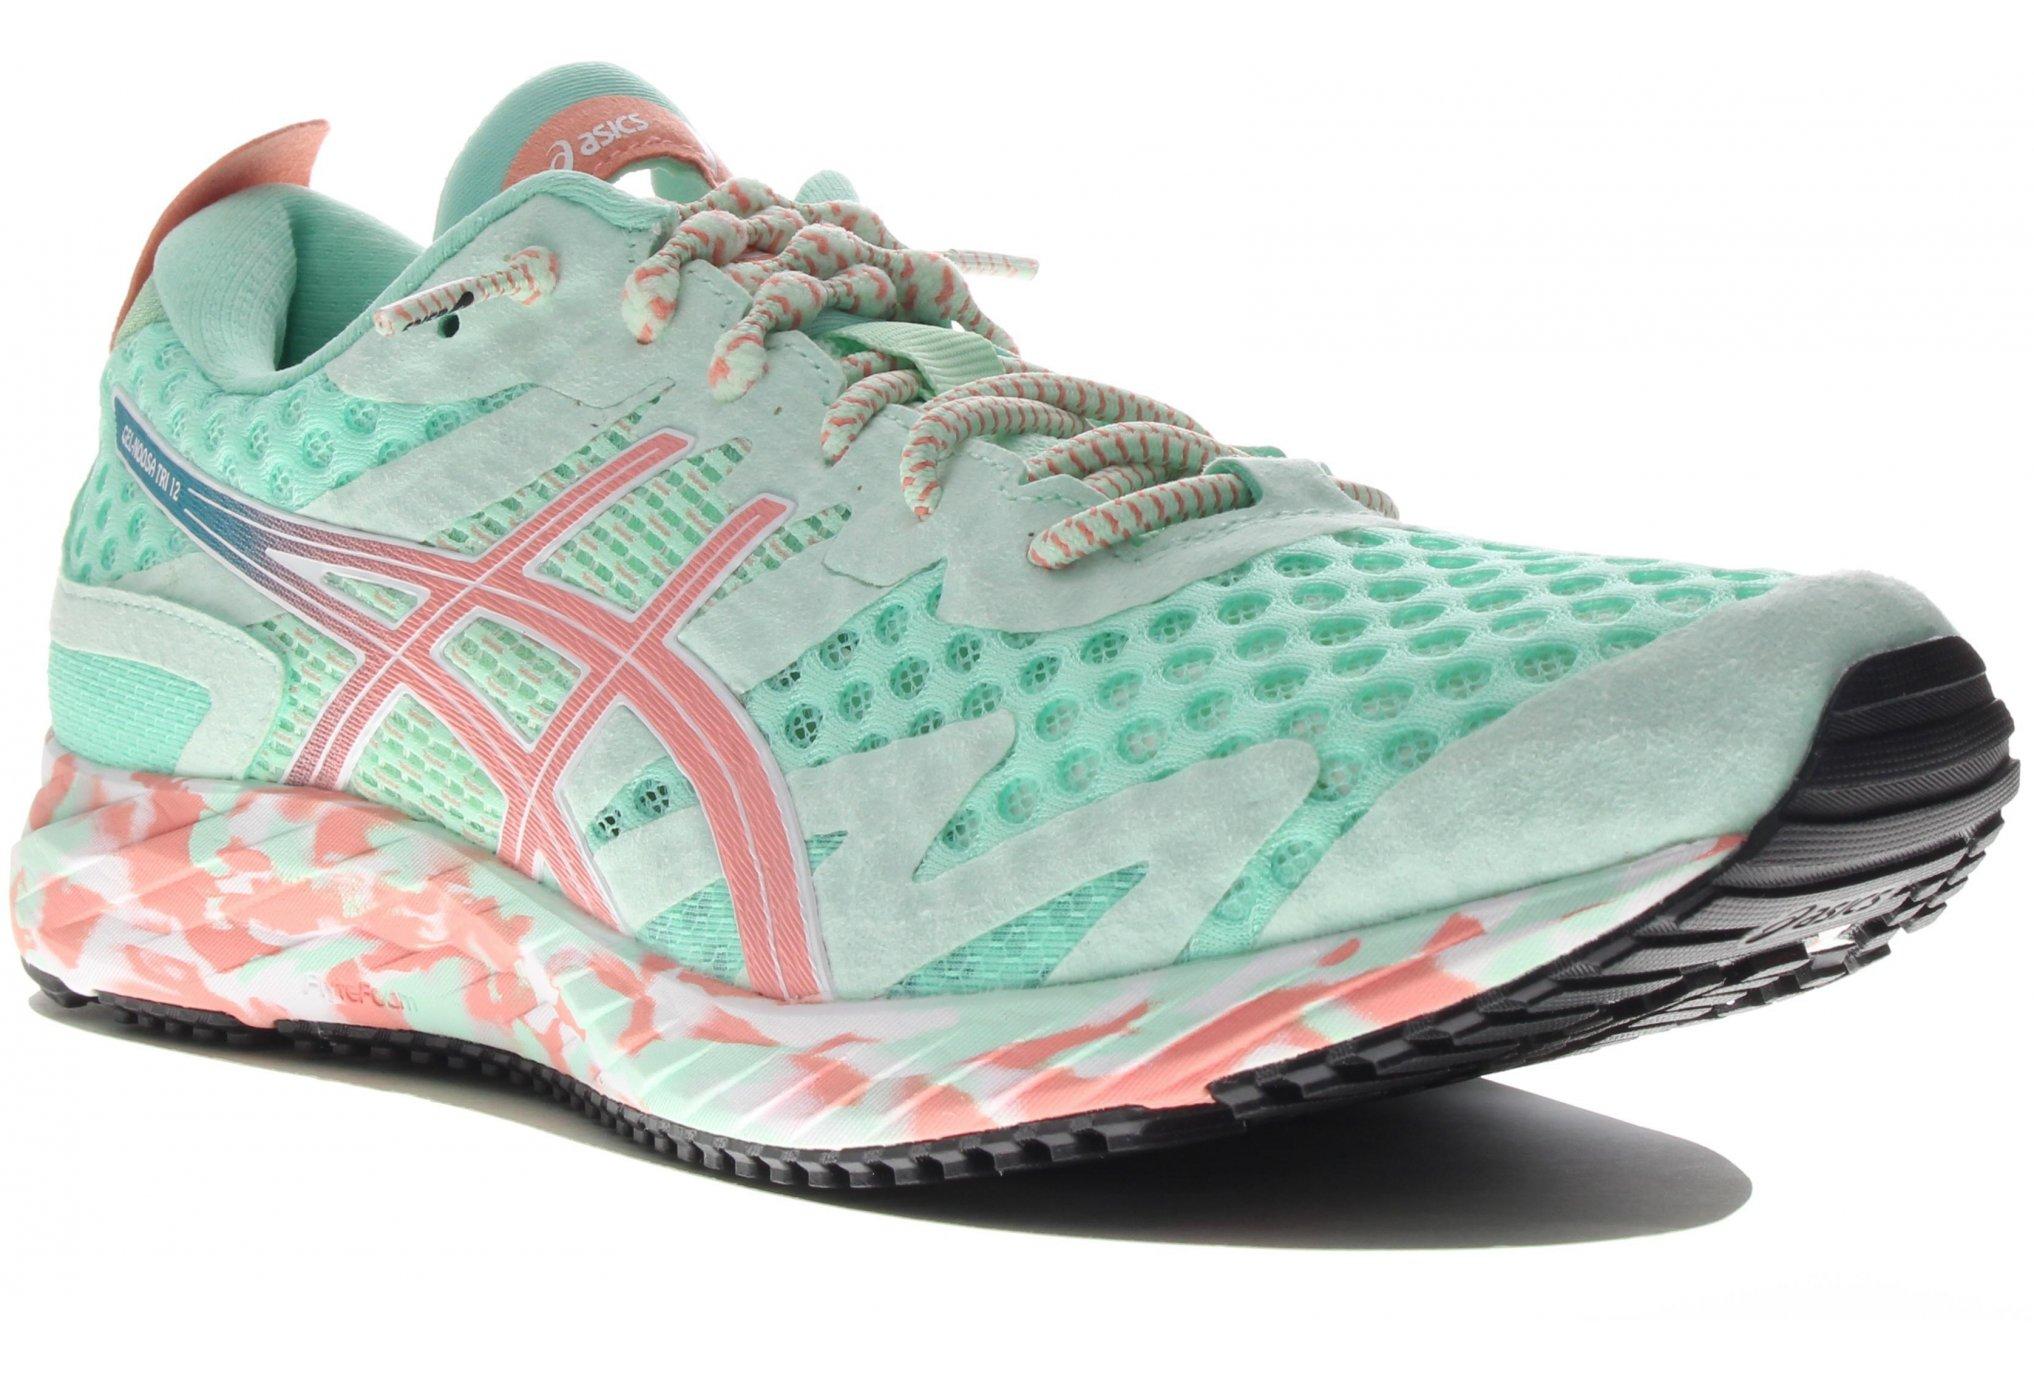 Asics Gel-Noosa Tri 12 Chaussures running femme